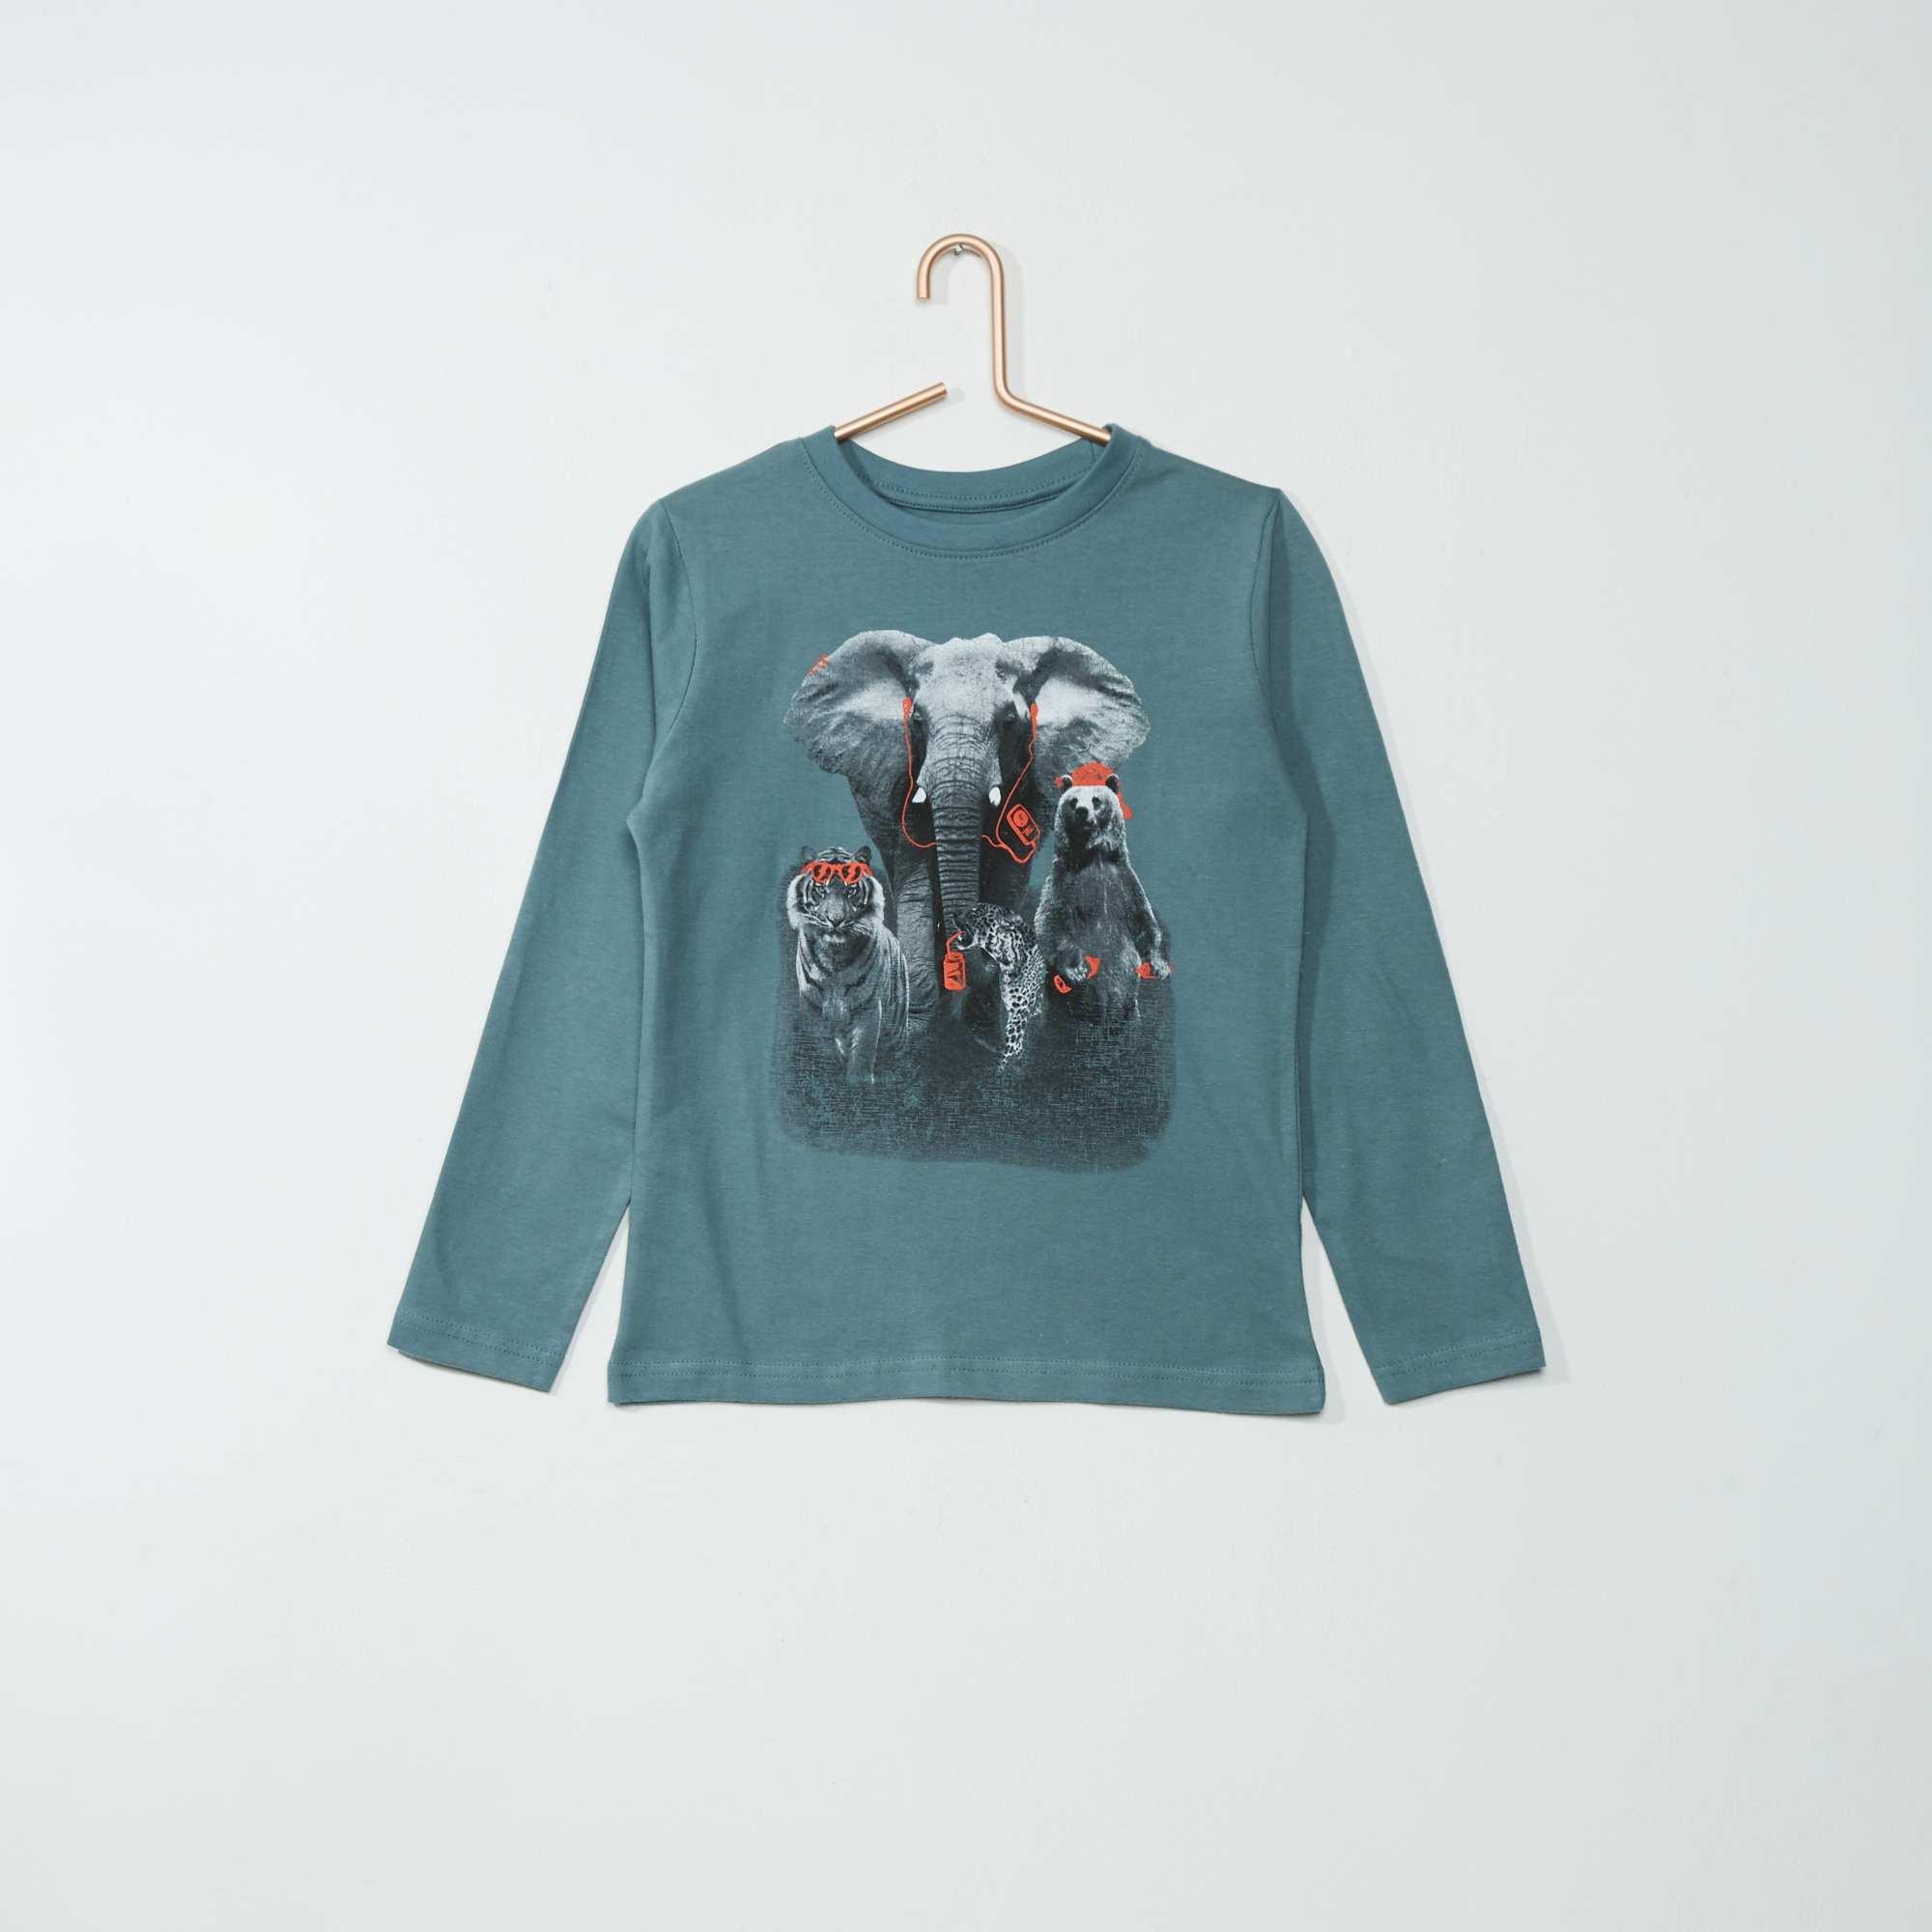 tee shirt coton imprim 39 animaux 39 gar on bleu gris kiabi 4 00. Black Bedroom Furniture Sets. Home Design Ideas